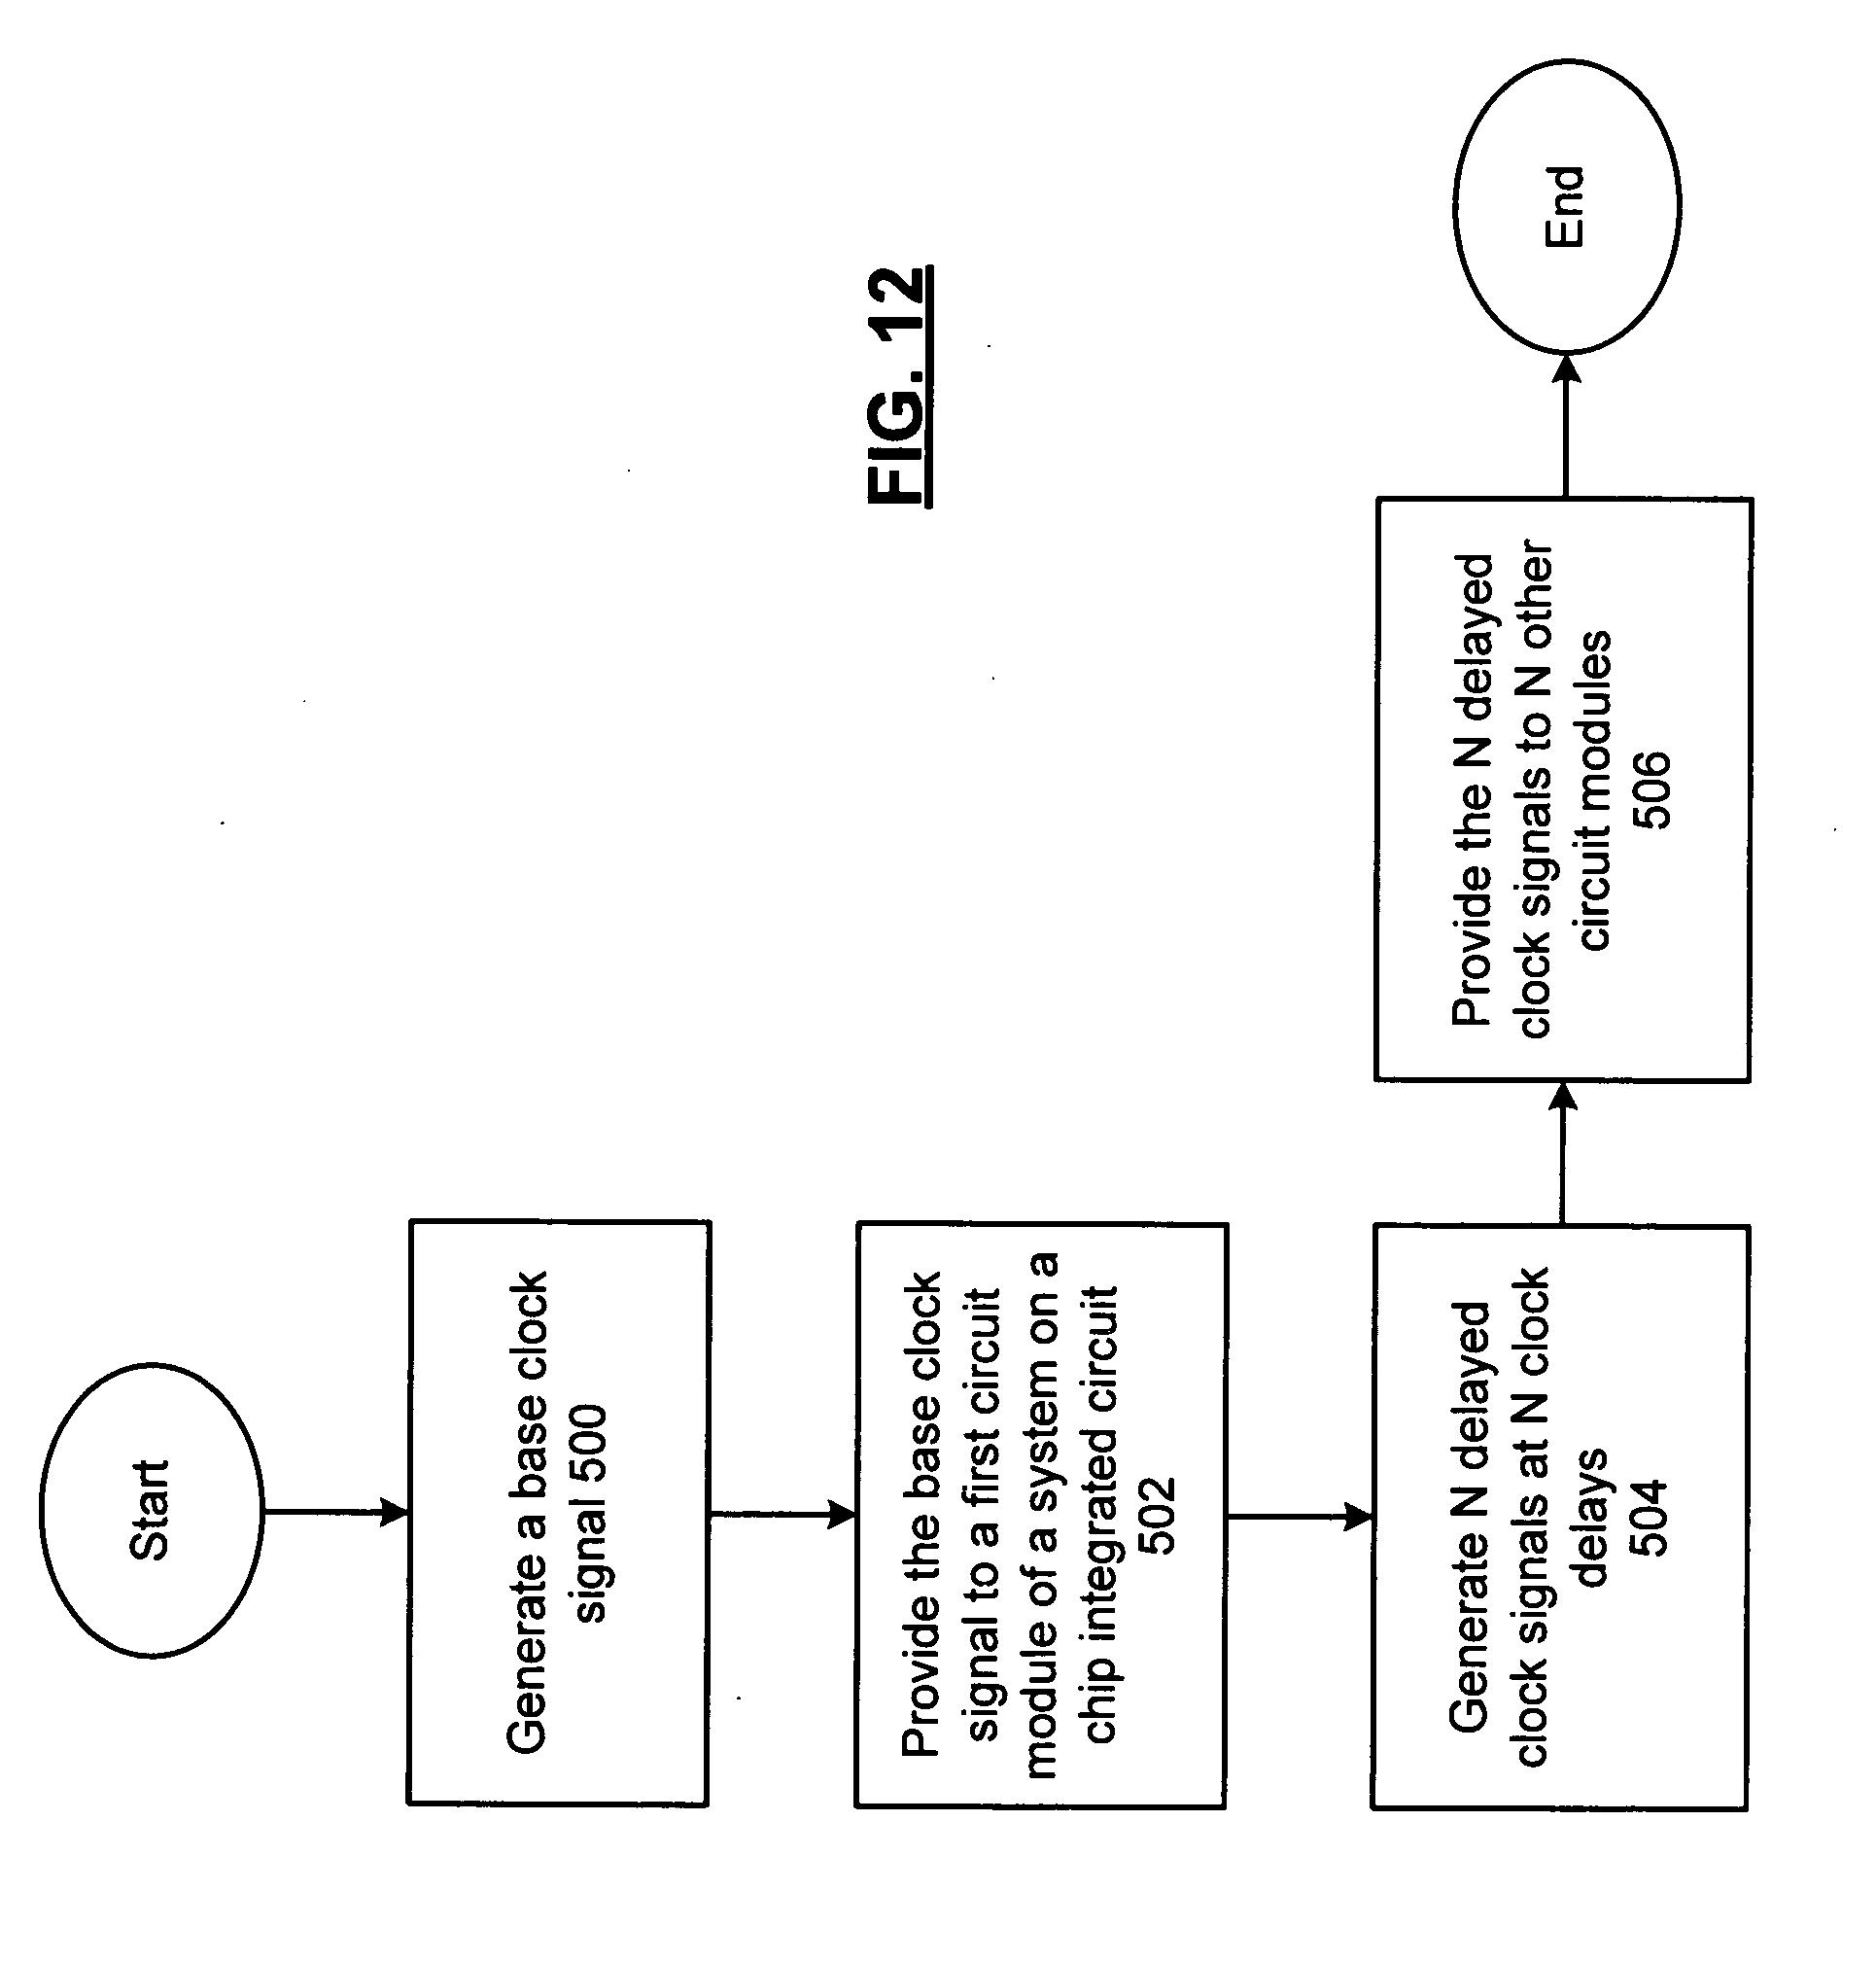 dvd decoding processing integreated circuit diagram